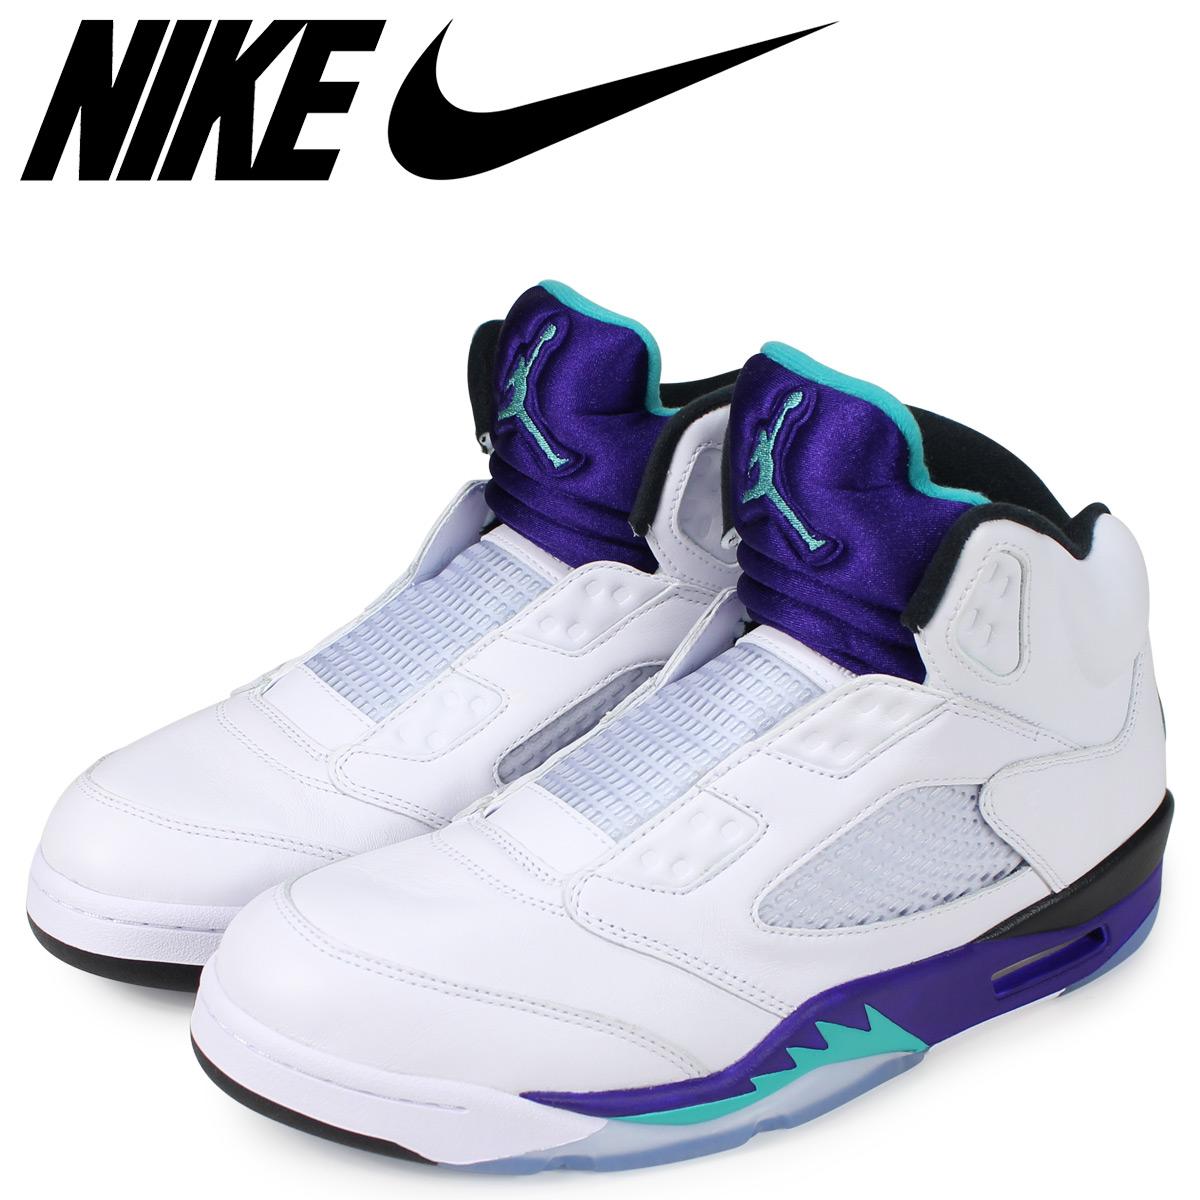 brand NIKE getting high popularity from sneakers freak .